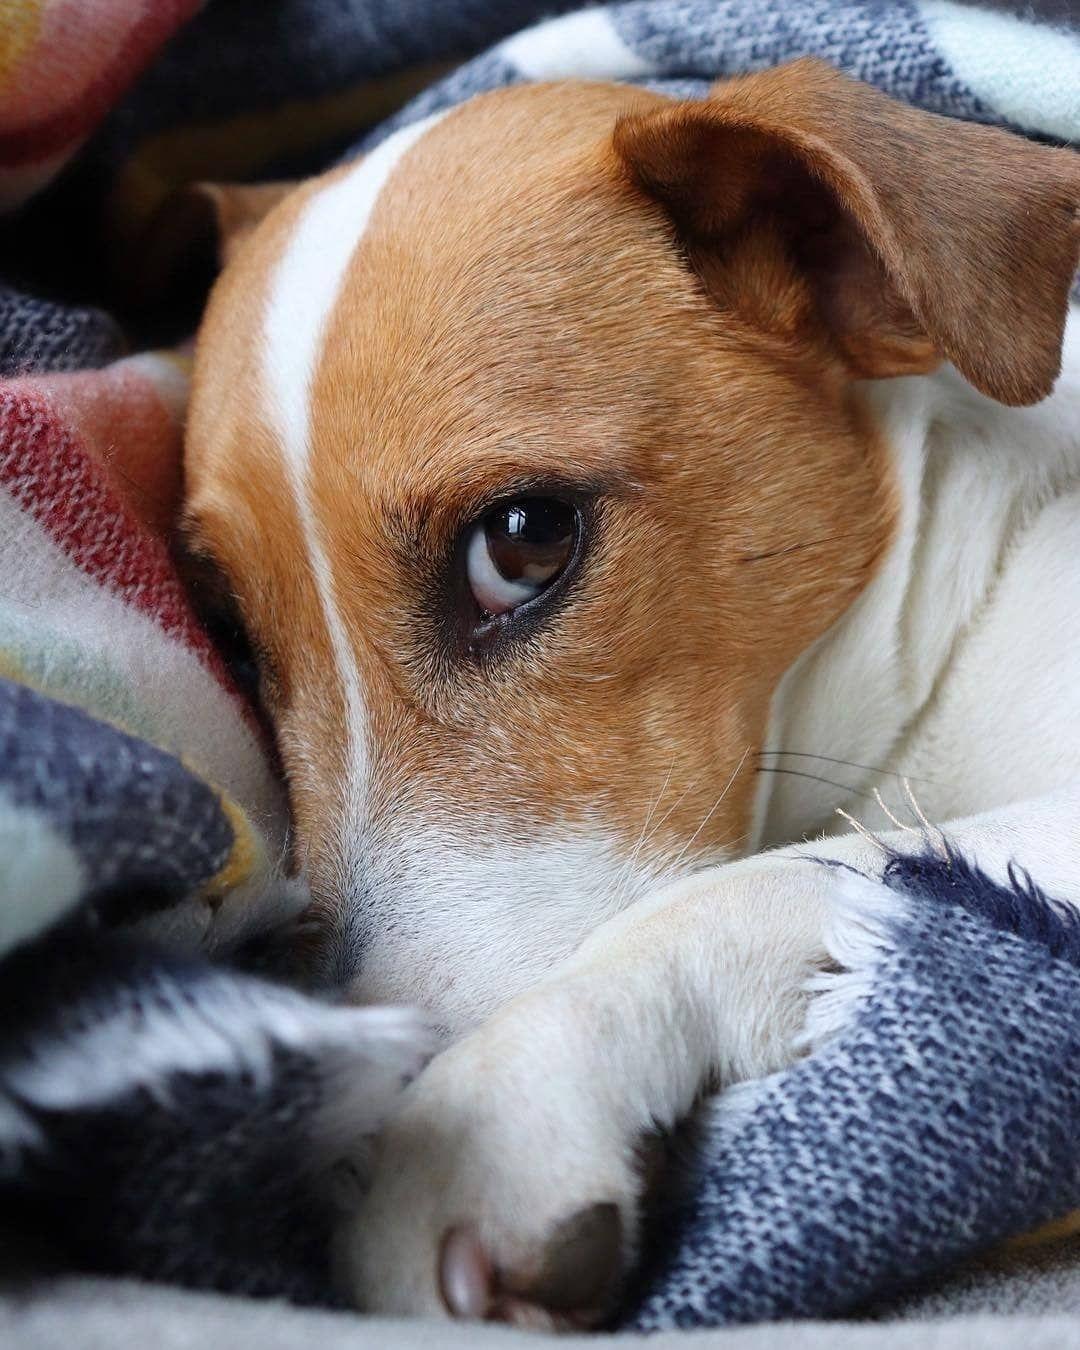 Pin By Anita On Dieser Blick Umwerfend Jack Russell Jack Russell Terrier Jack Russell Terrier Puppies